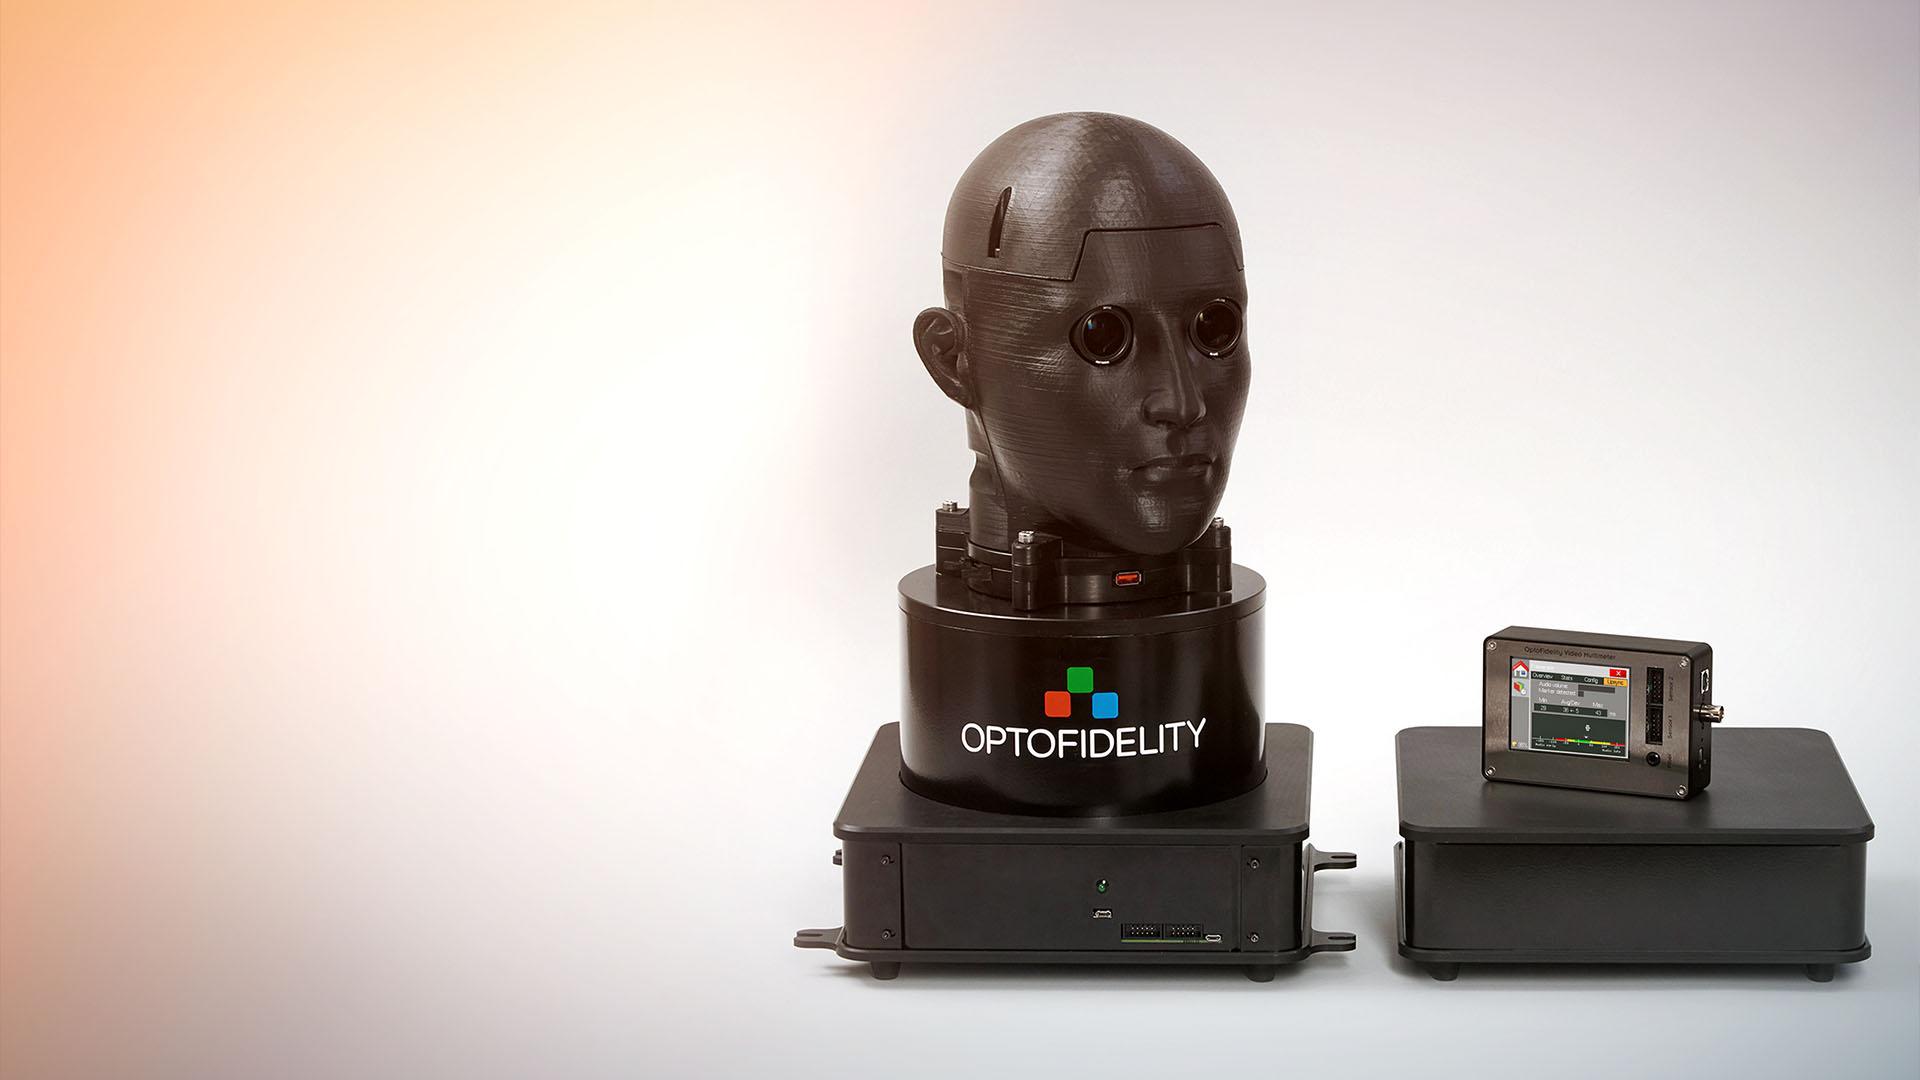 Optofidelity XR headset testing software